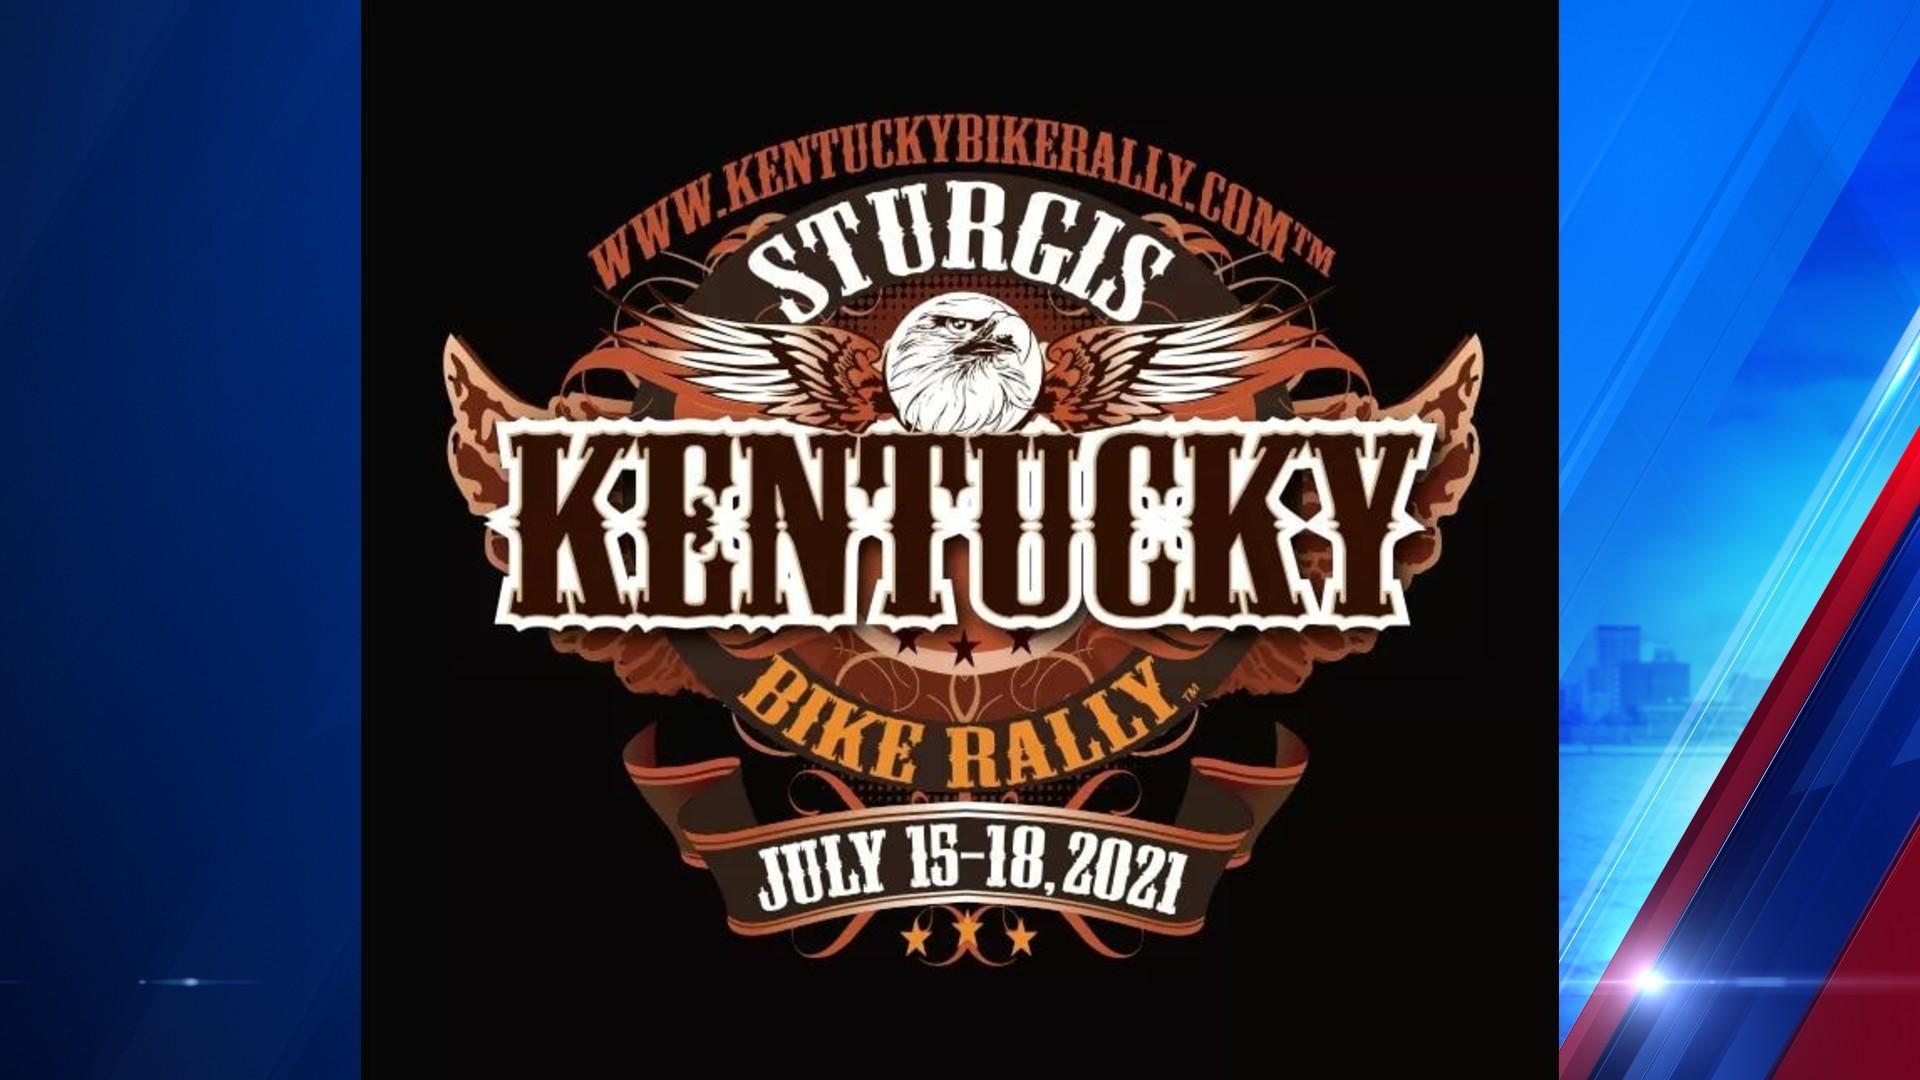 Sturgis Kentucky Bike Rally 2021